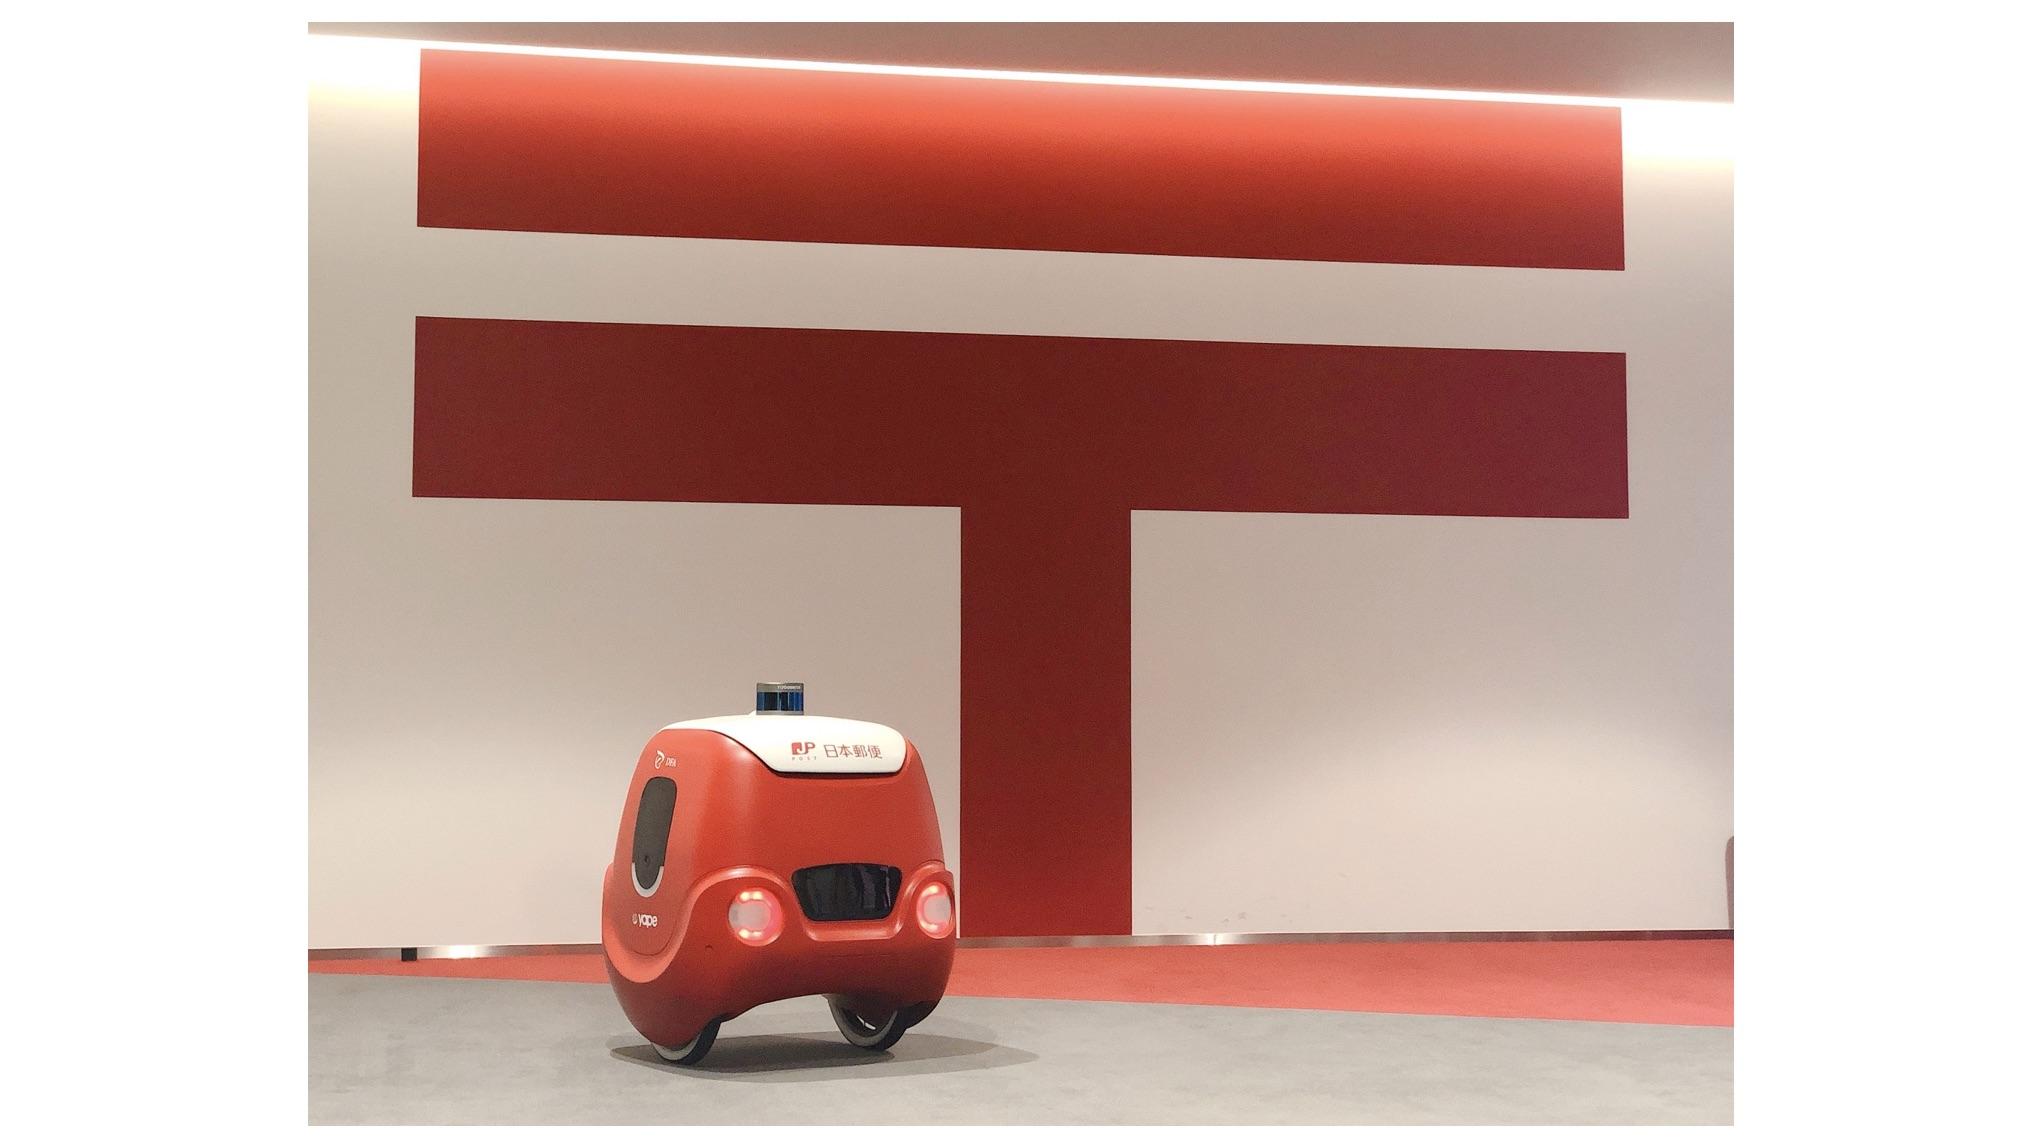 Drone Future Aviation×日本郵便 | 配送ロボットによる屋内での無人配送に向けて配送試行を実施